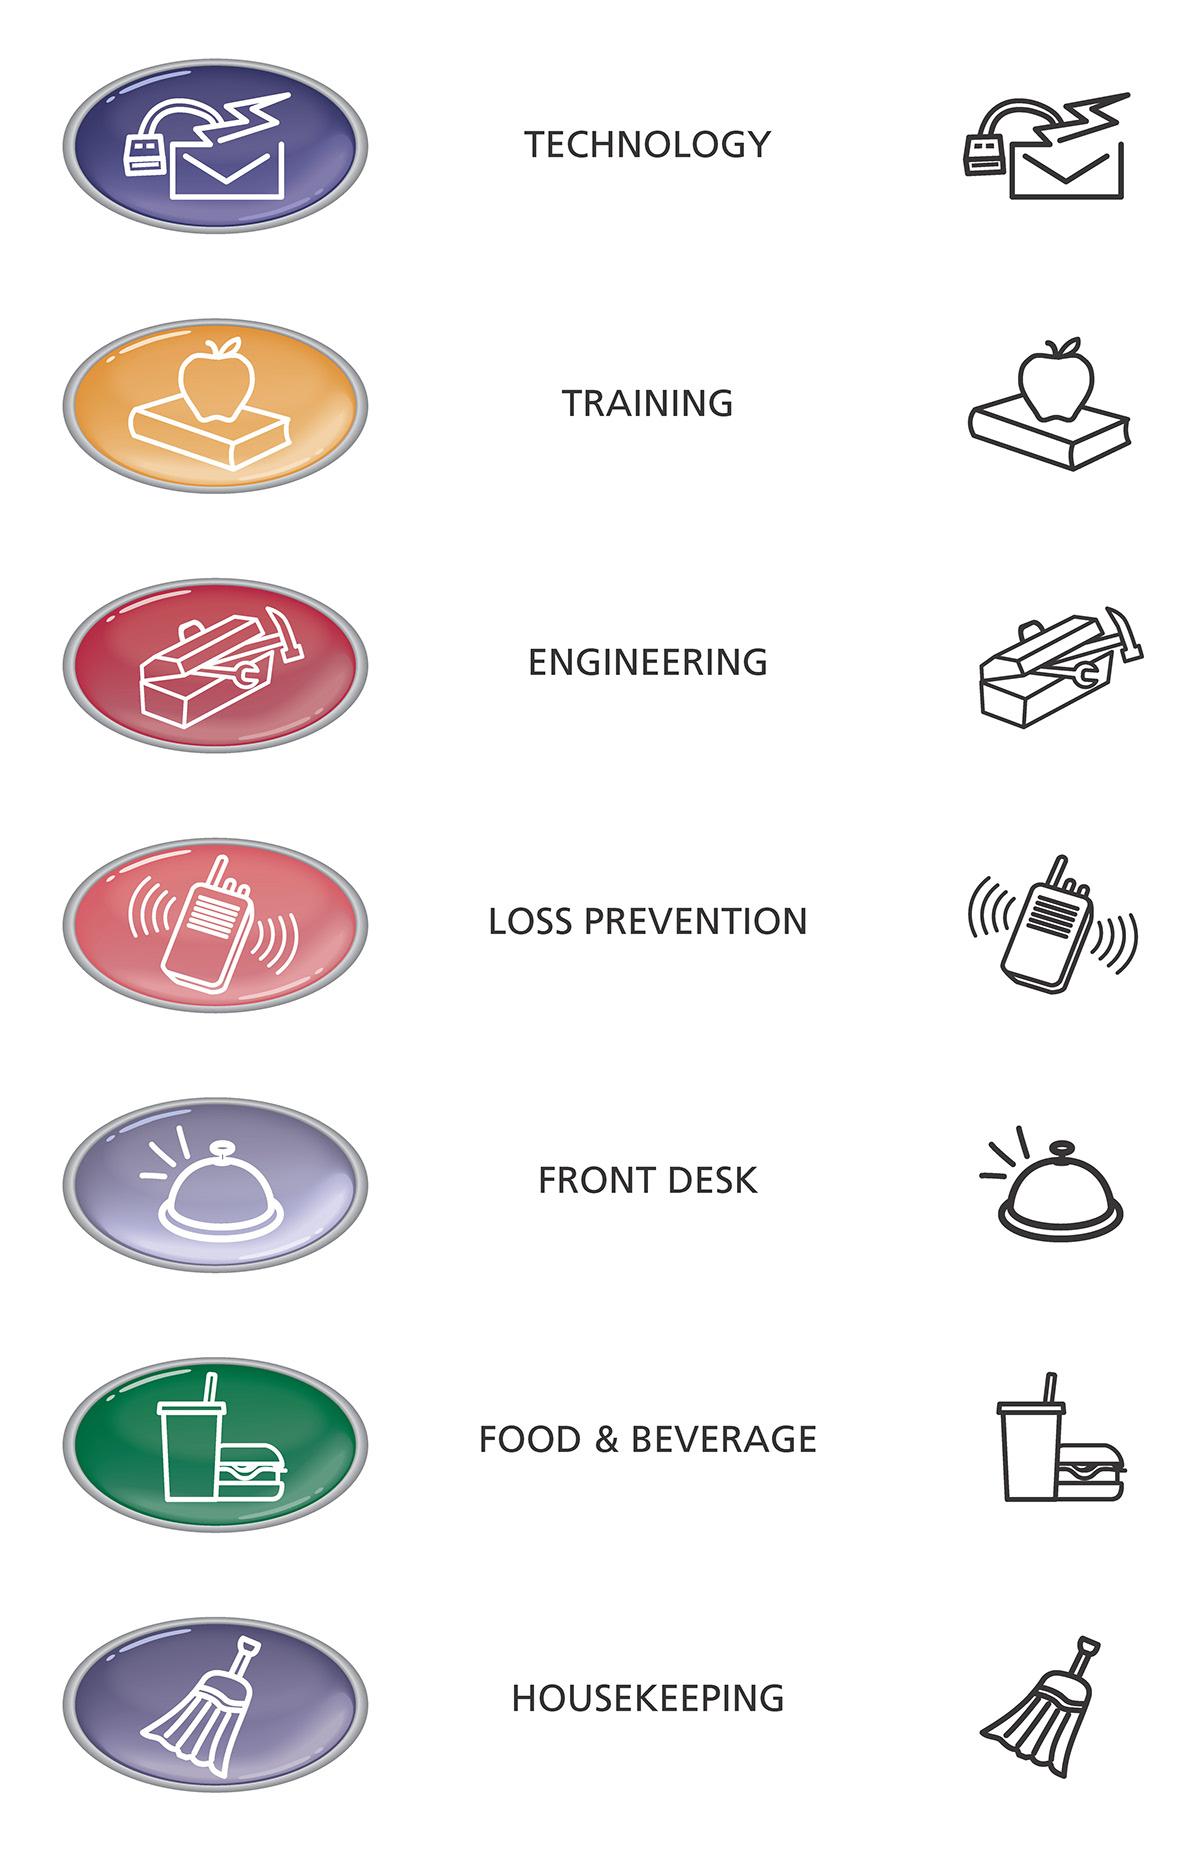 icons,ILLUSTRATION ,infographic,Marriott,pictograph,symbol,UI,instructional,training,logo